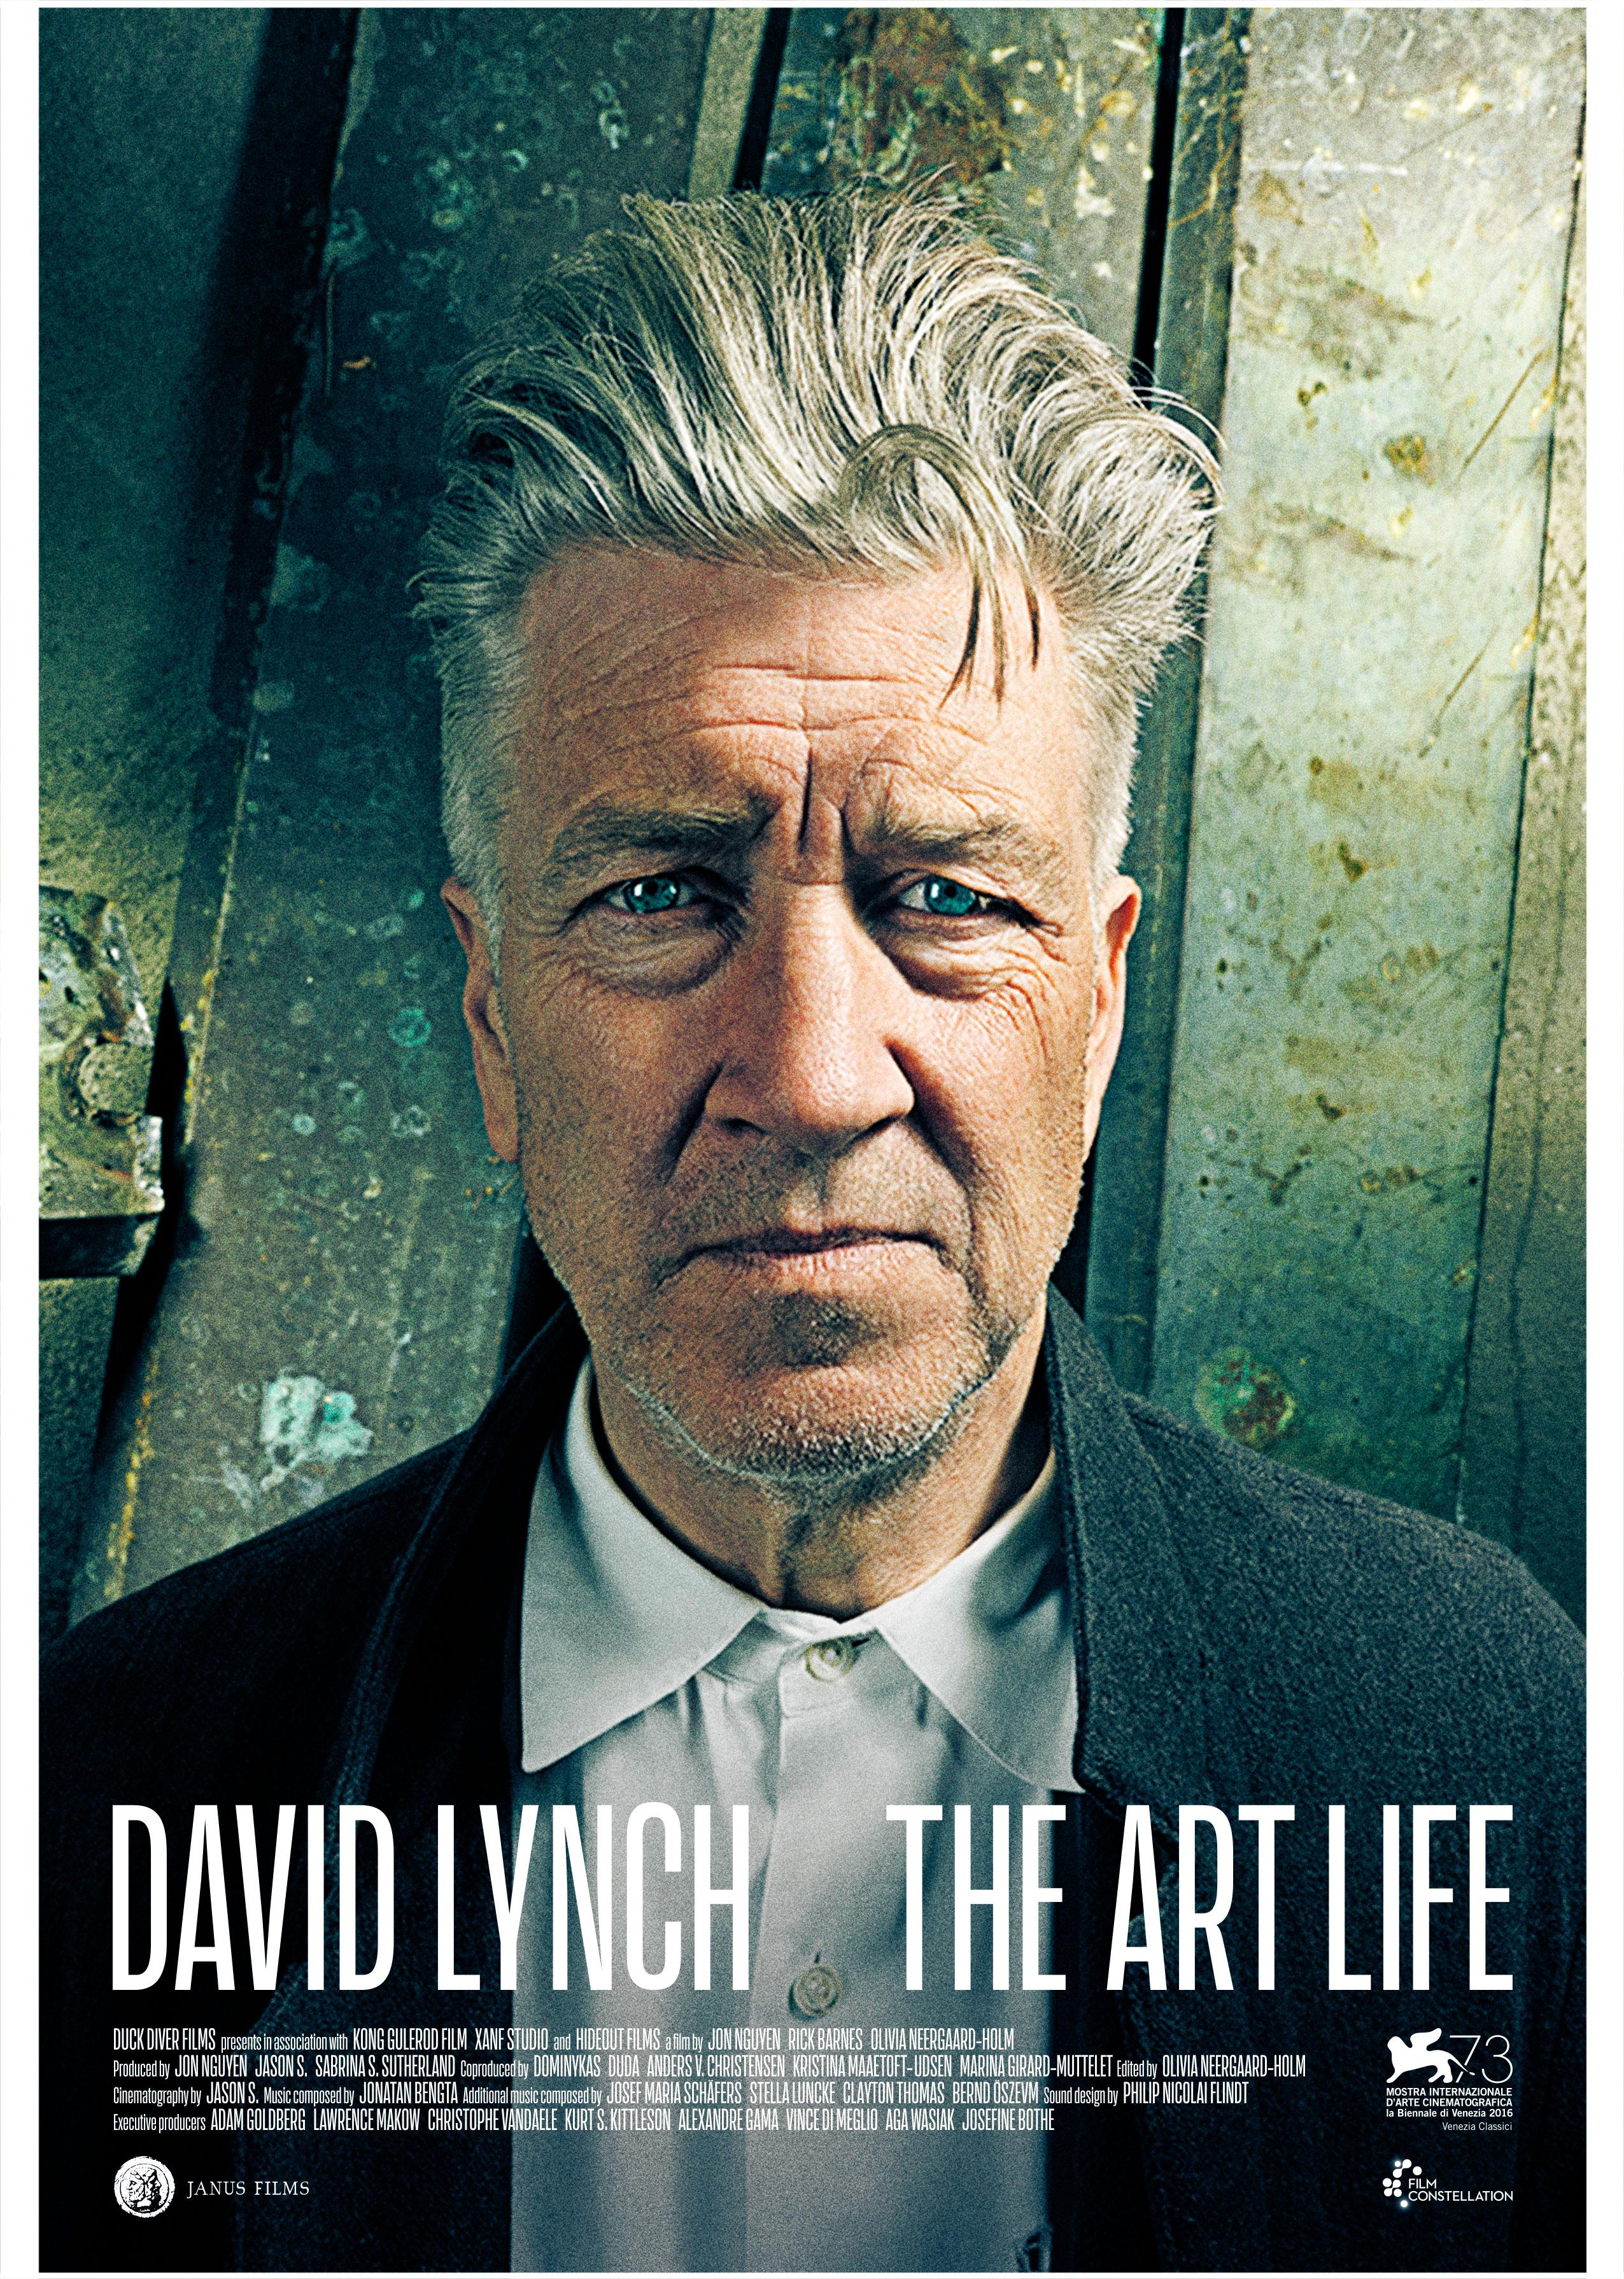 DavidLynch_ArtLife_poster-2